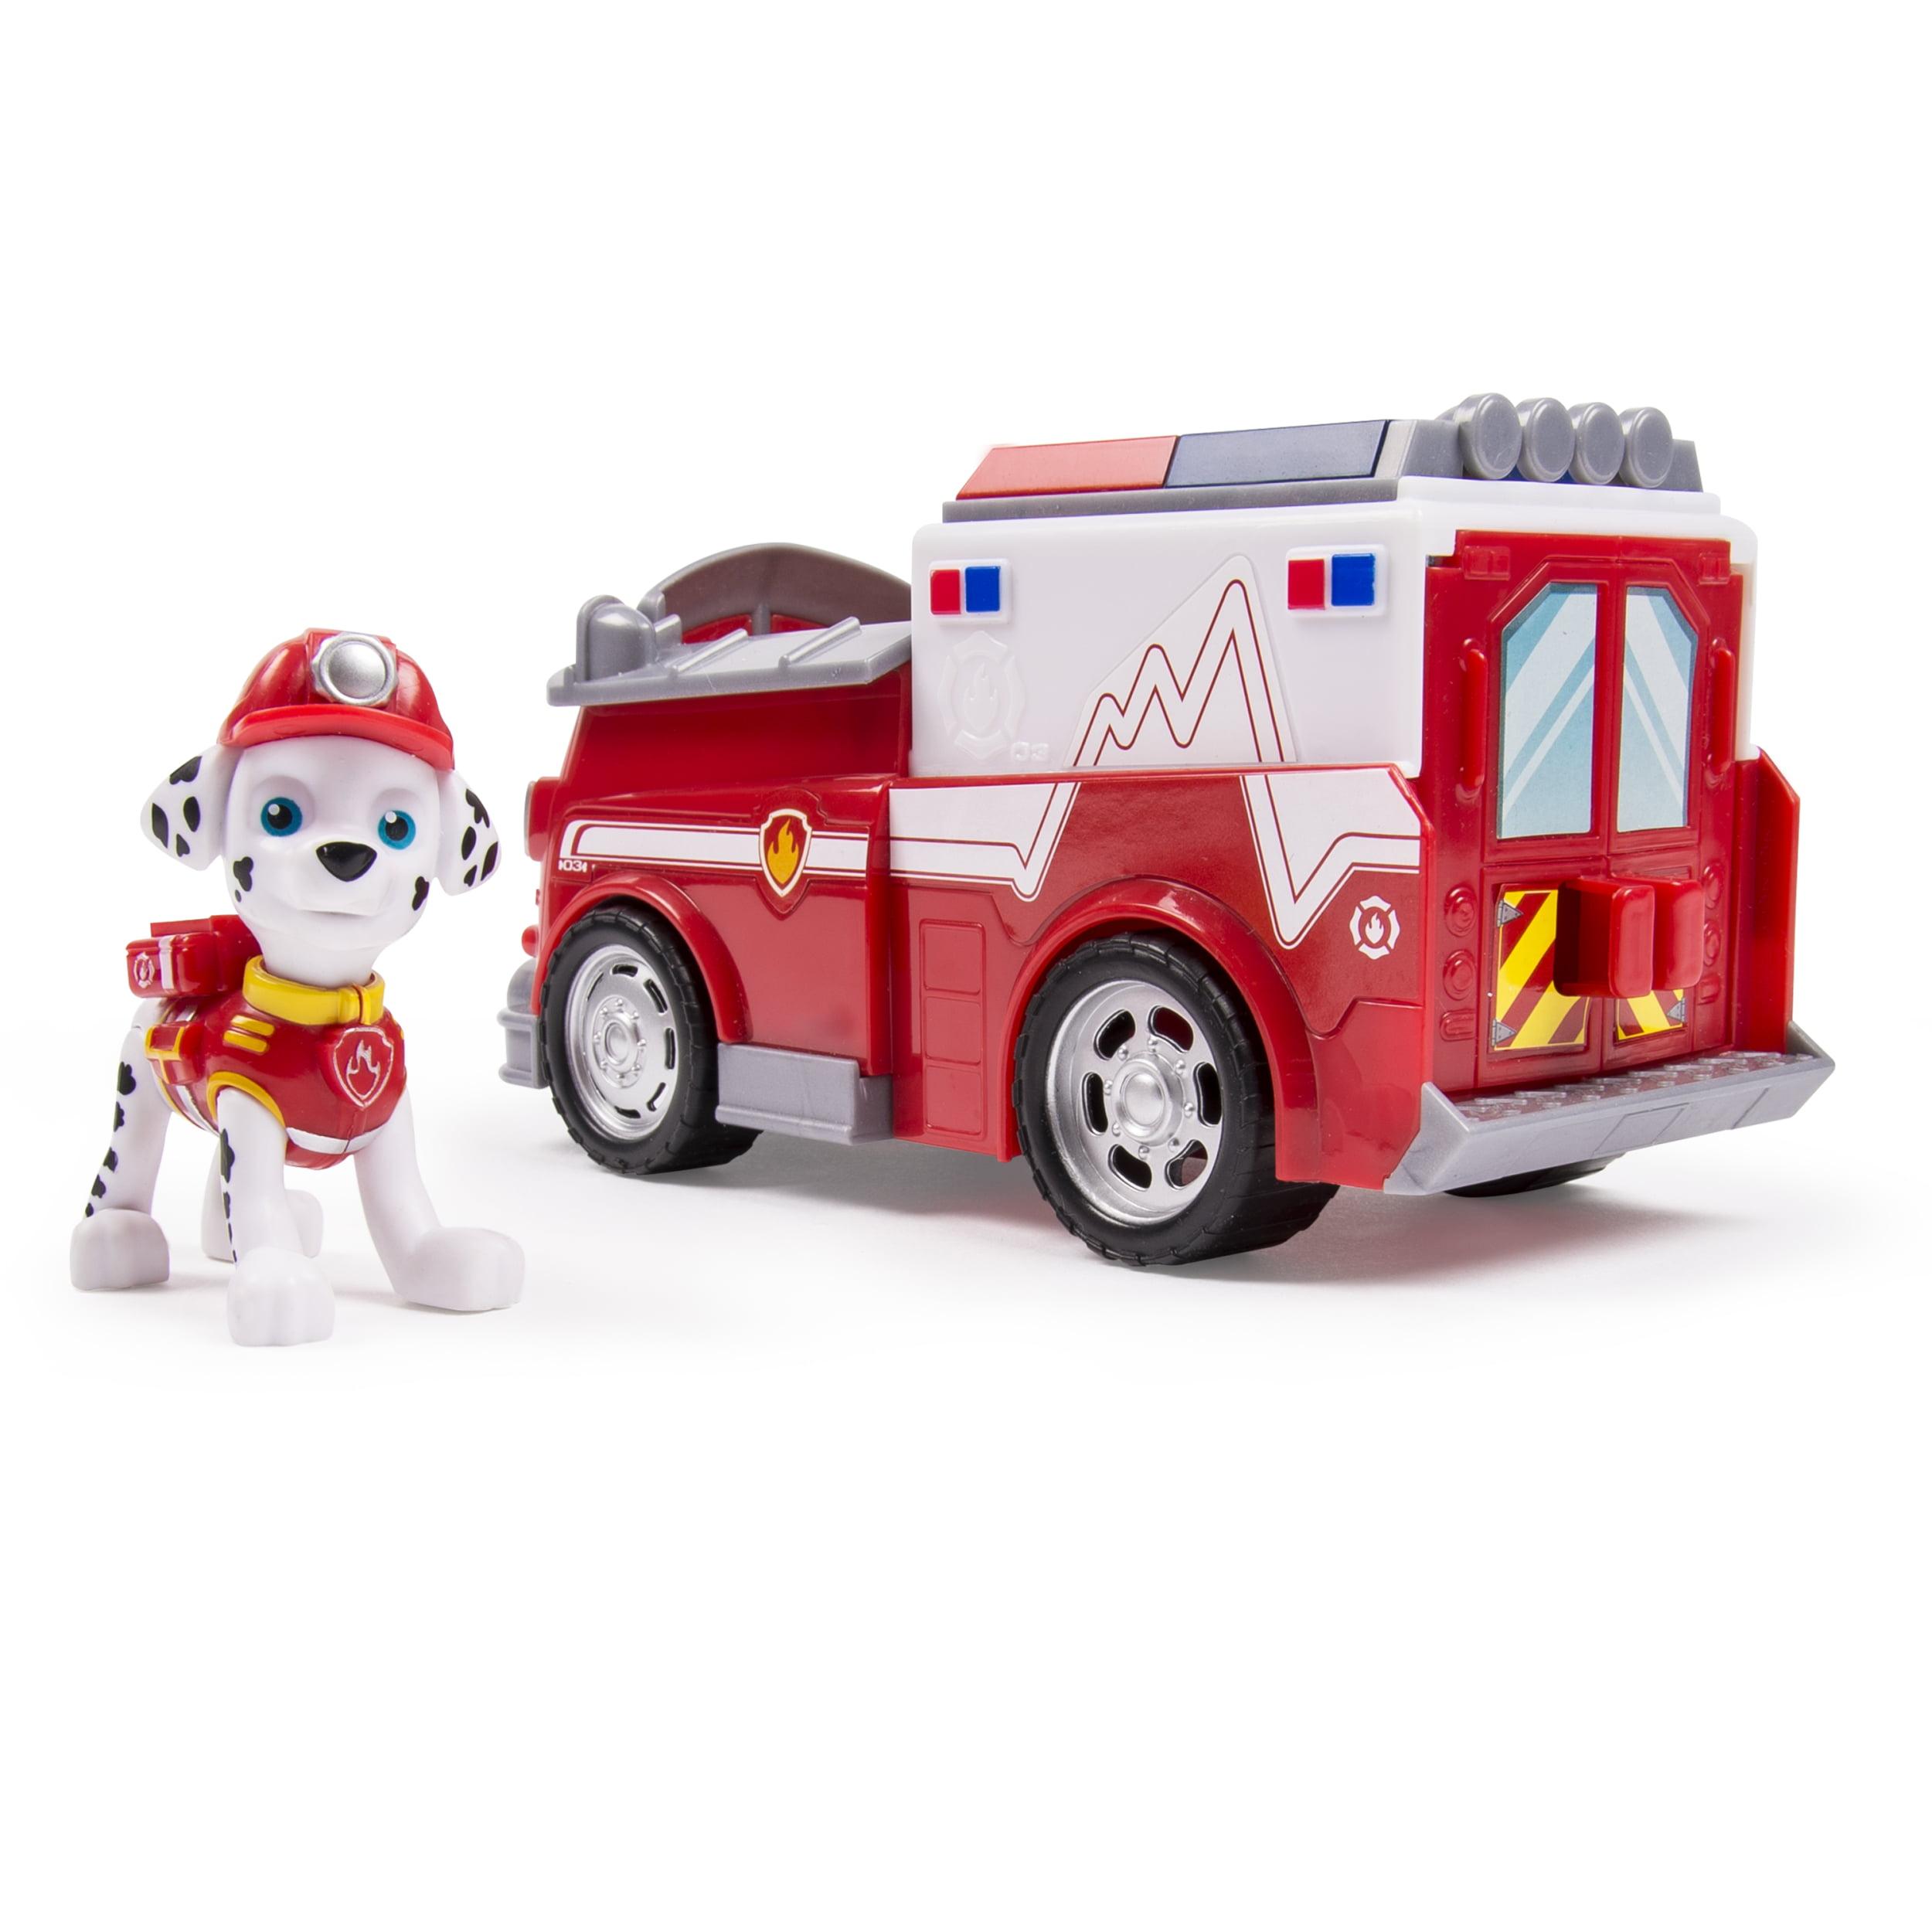 Paw Patrol Marshall's Firetruck, Vehicle and Figure